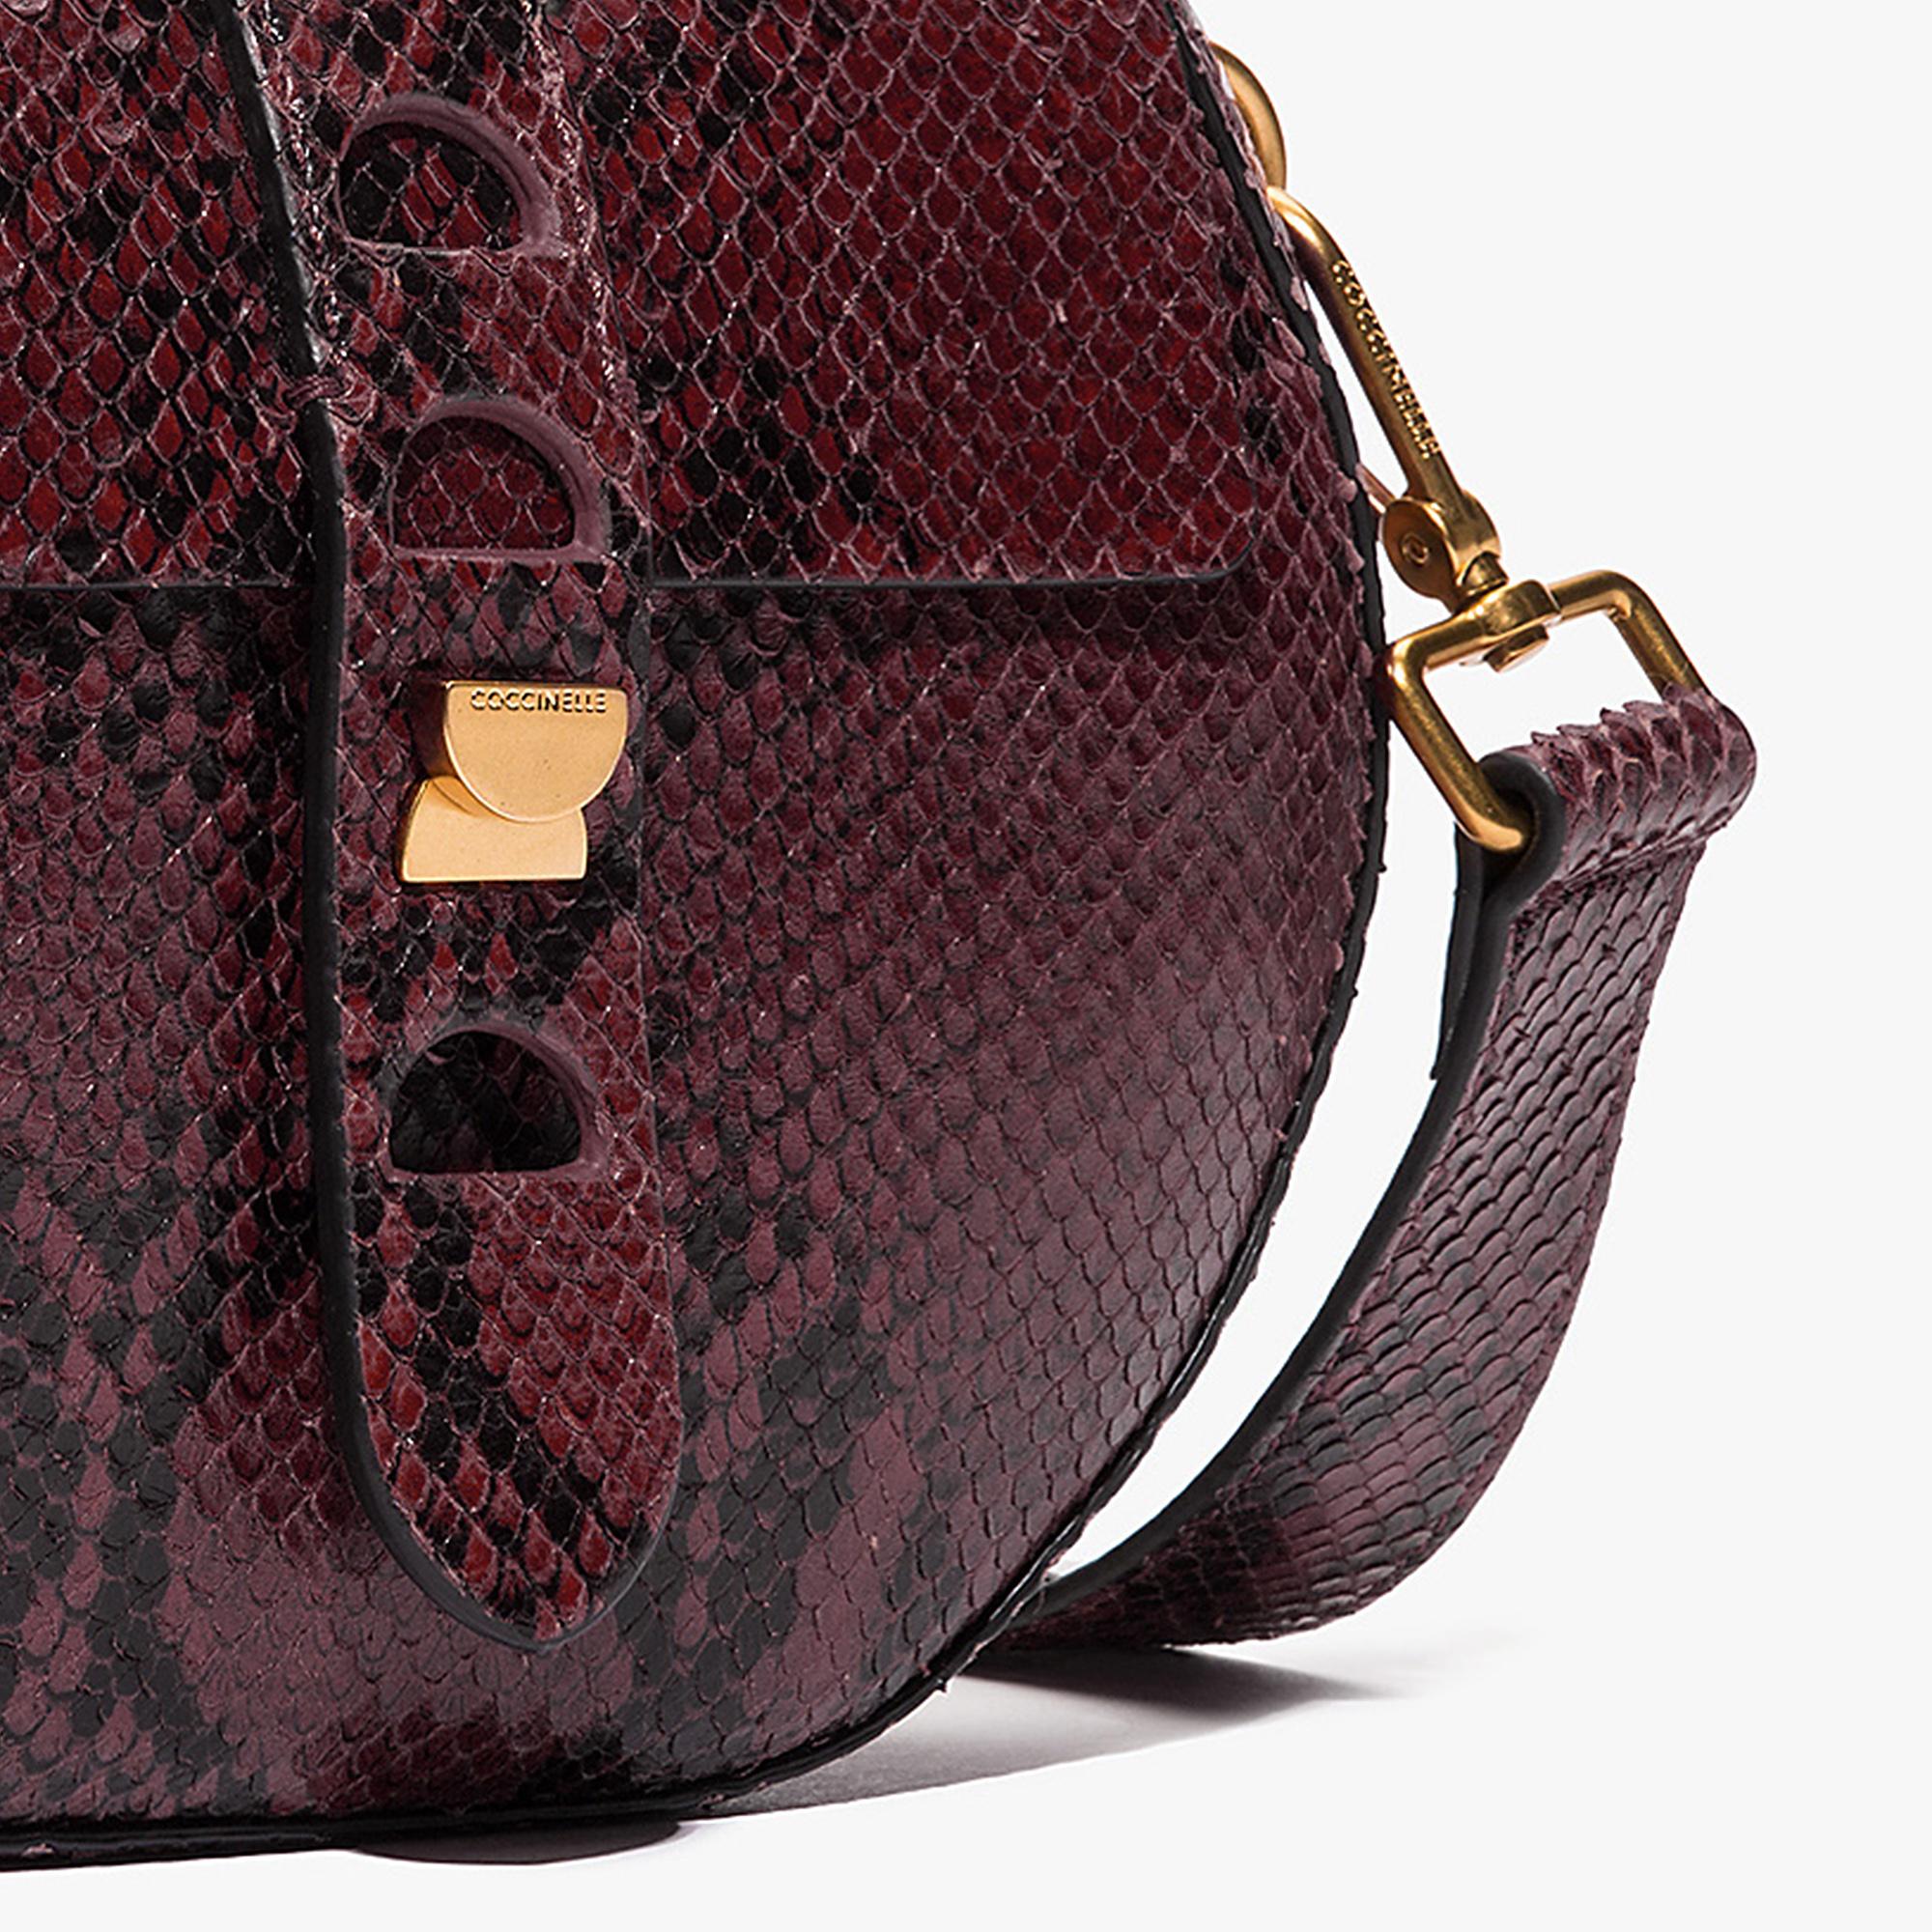 Carousel python-print leather mini bag